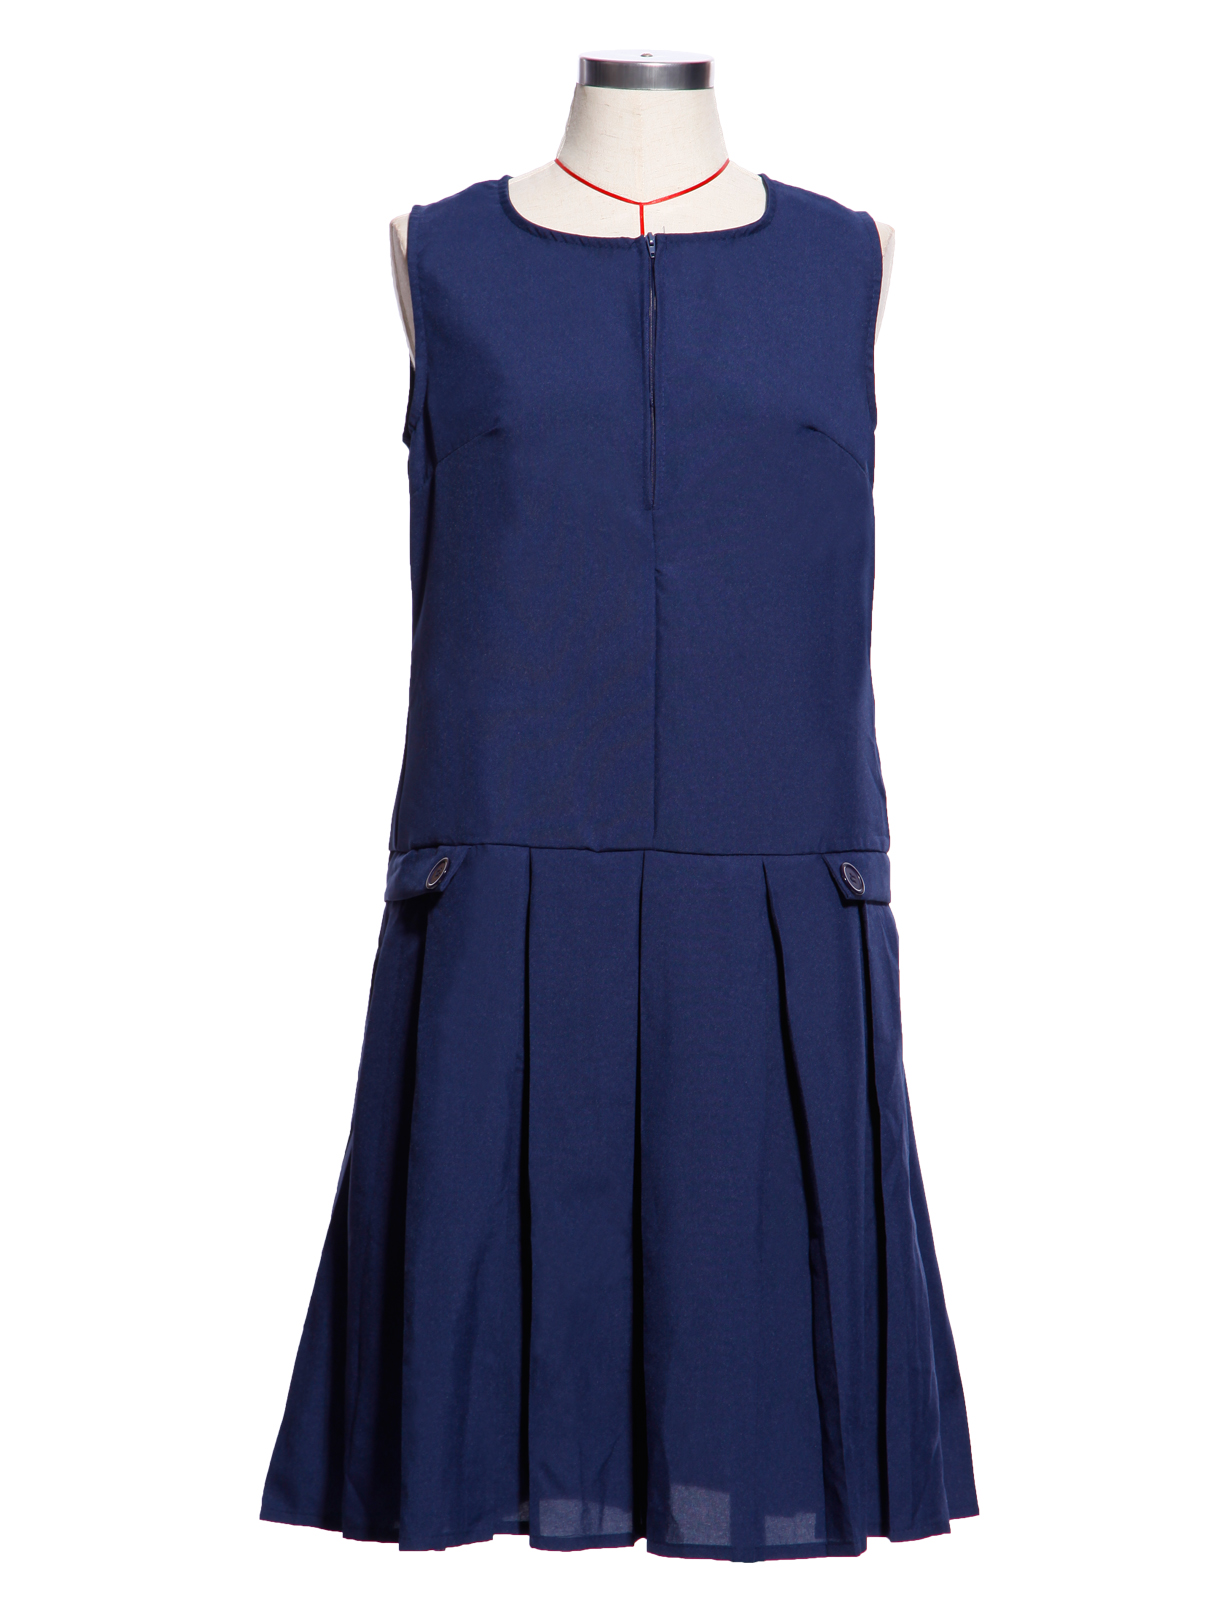 c6288d13c7 Details about Ages 13-16 Girls Kids Summer Pinafore School Pleated Dress  Uniform Grey Black